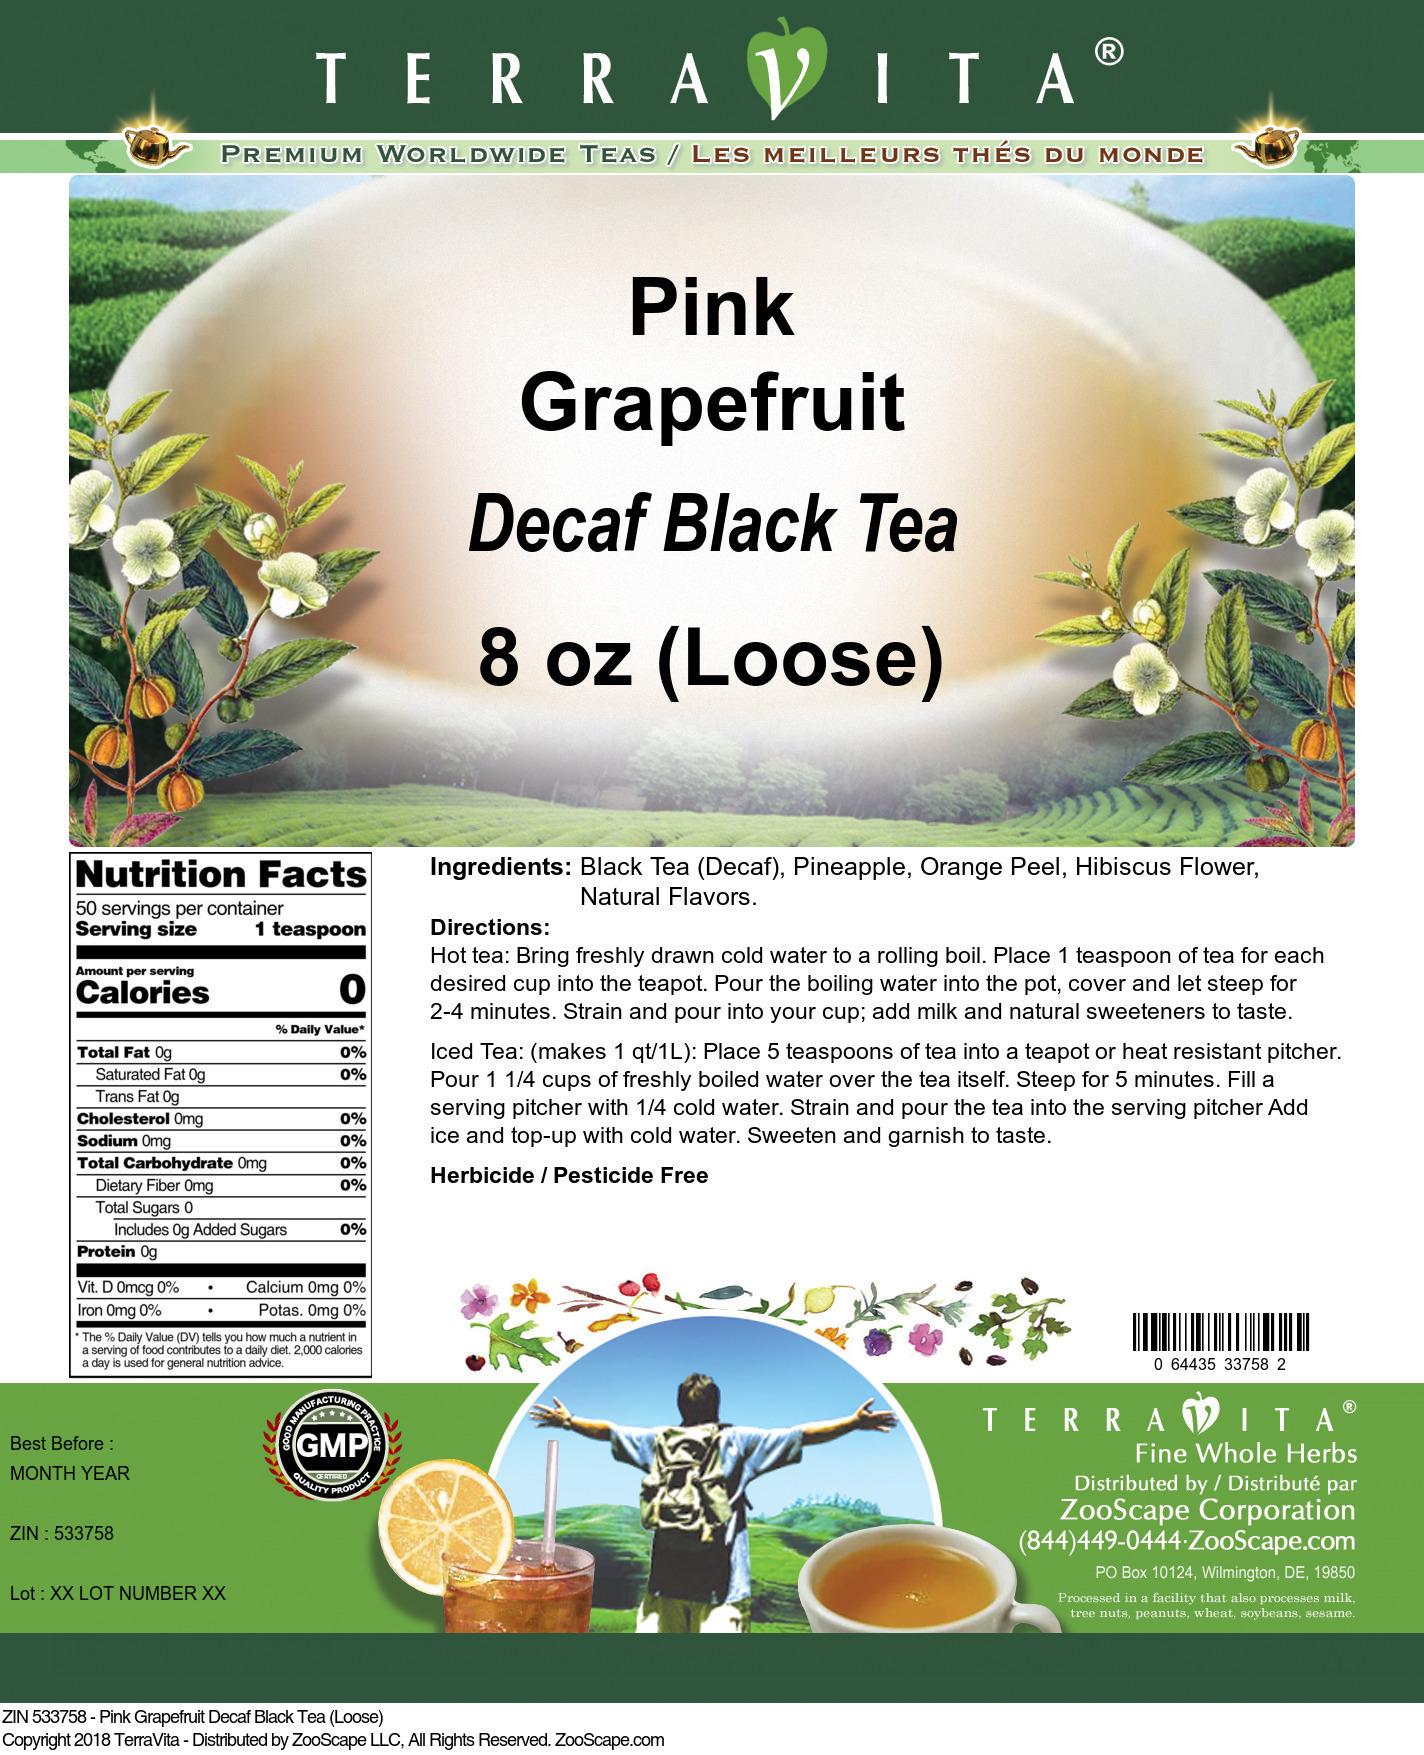 Pink Grapefruit Decaf Black Tea (Loose)